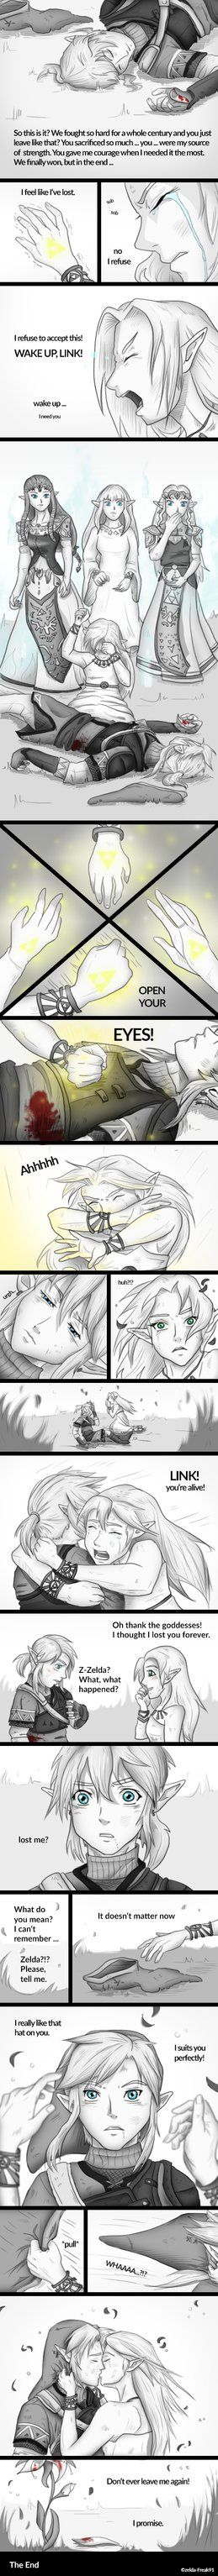 Zelda: In The End - 3 by zelda-Freak91.deviantart.com on @DeviantArt